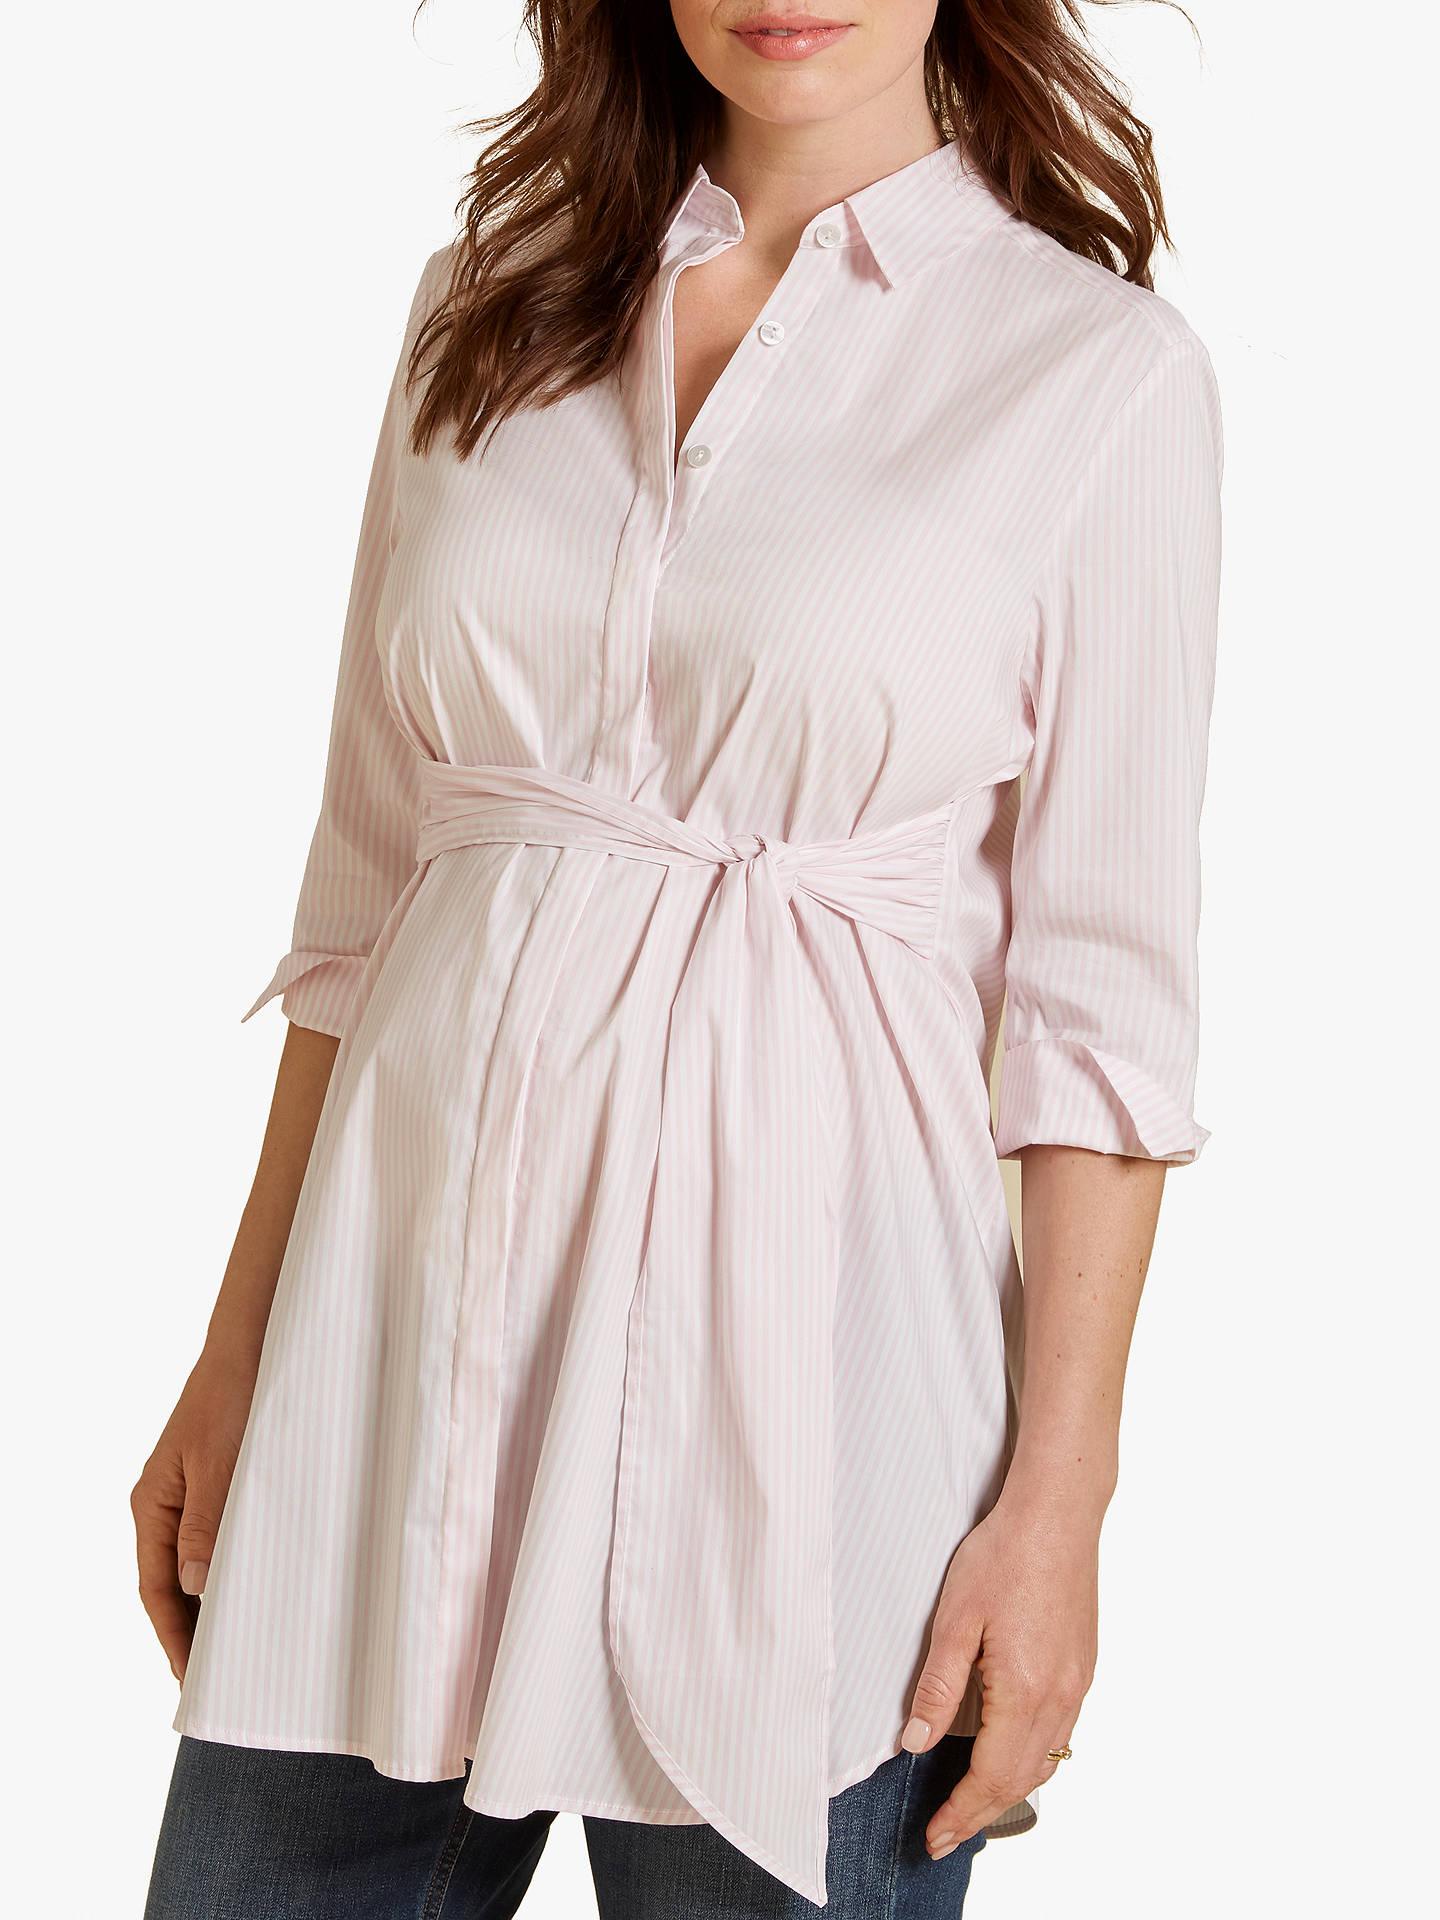 3fee572bb2f20 Buy Isabella Oliver Dora Striped Maternity Shirt, Pink, 8 Online at  johnlewis.com ...